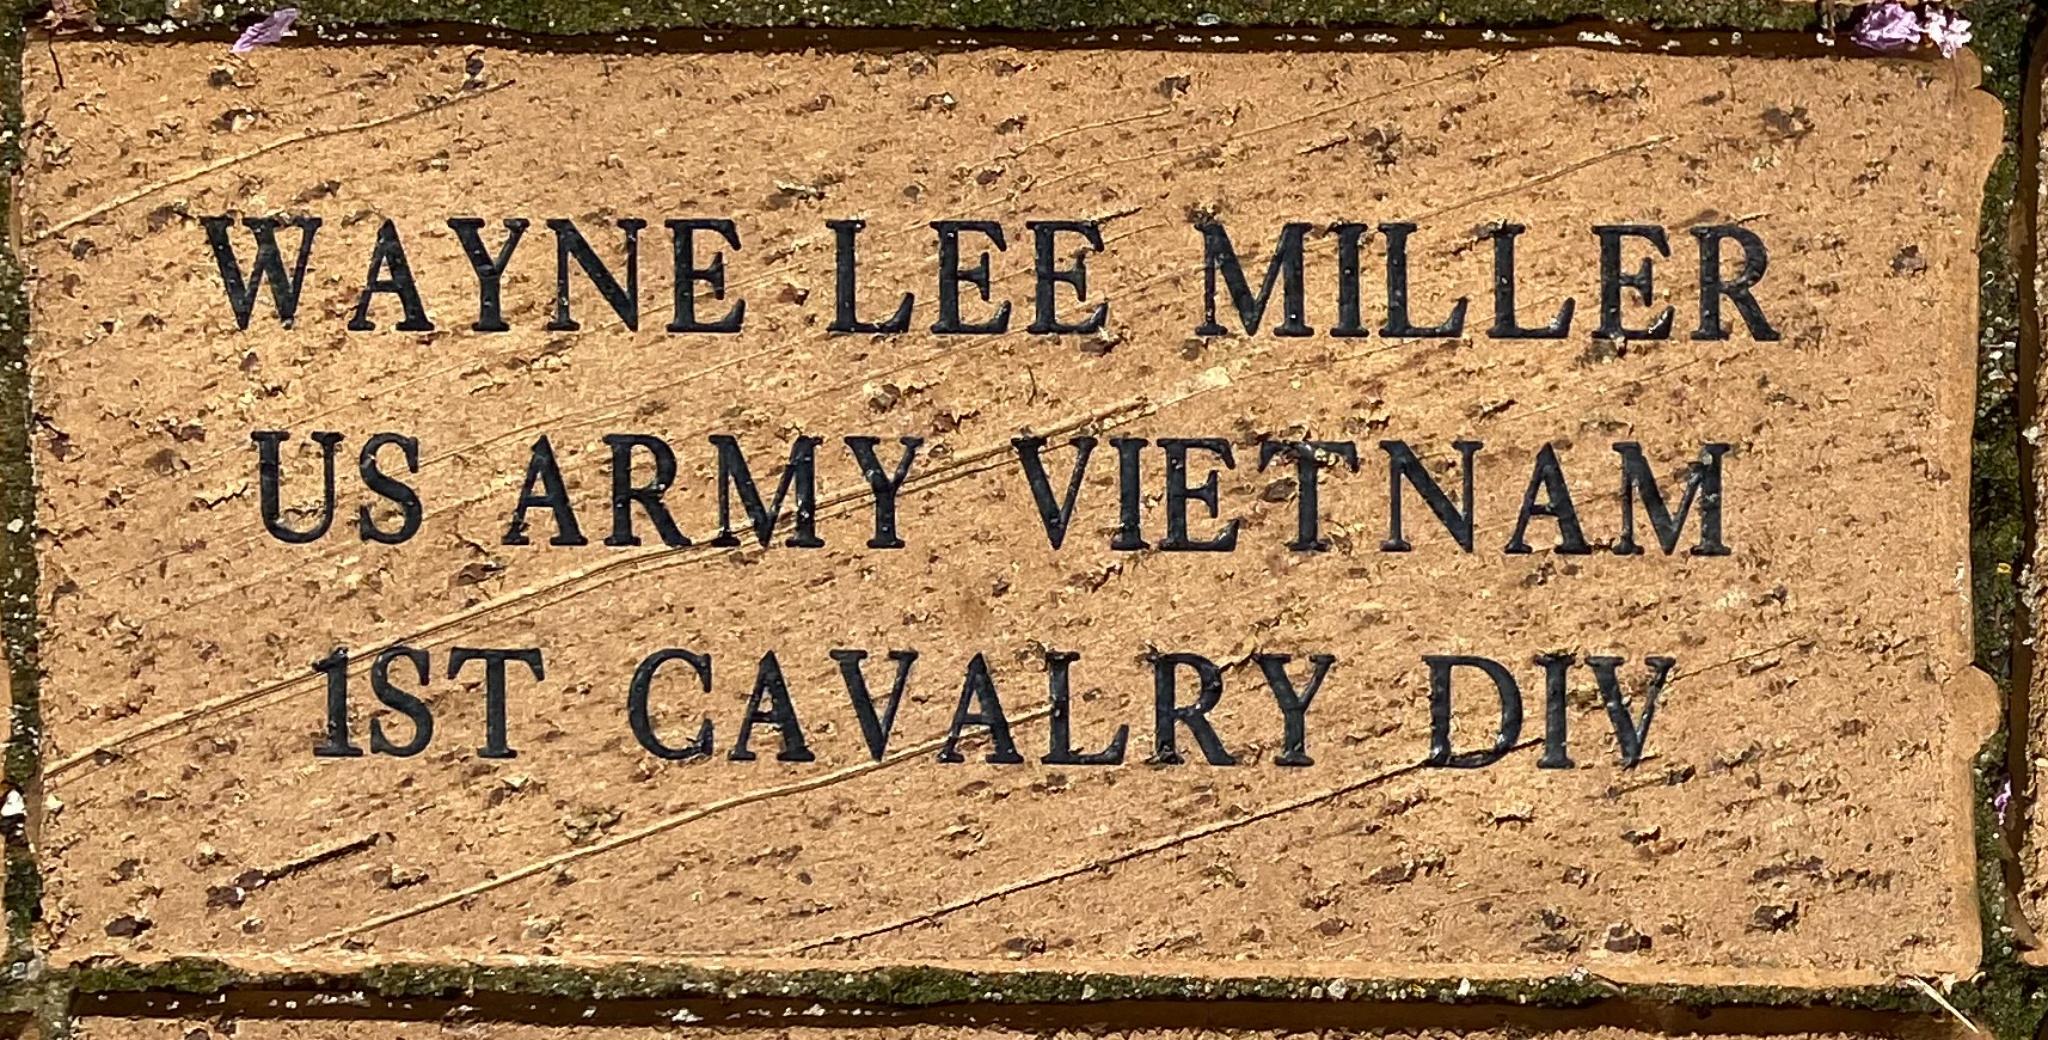 WAYNE LEE MILLER US ARMY VIETNAM 1ST CAVALRY DIV